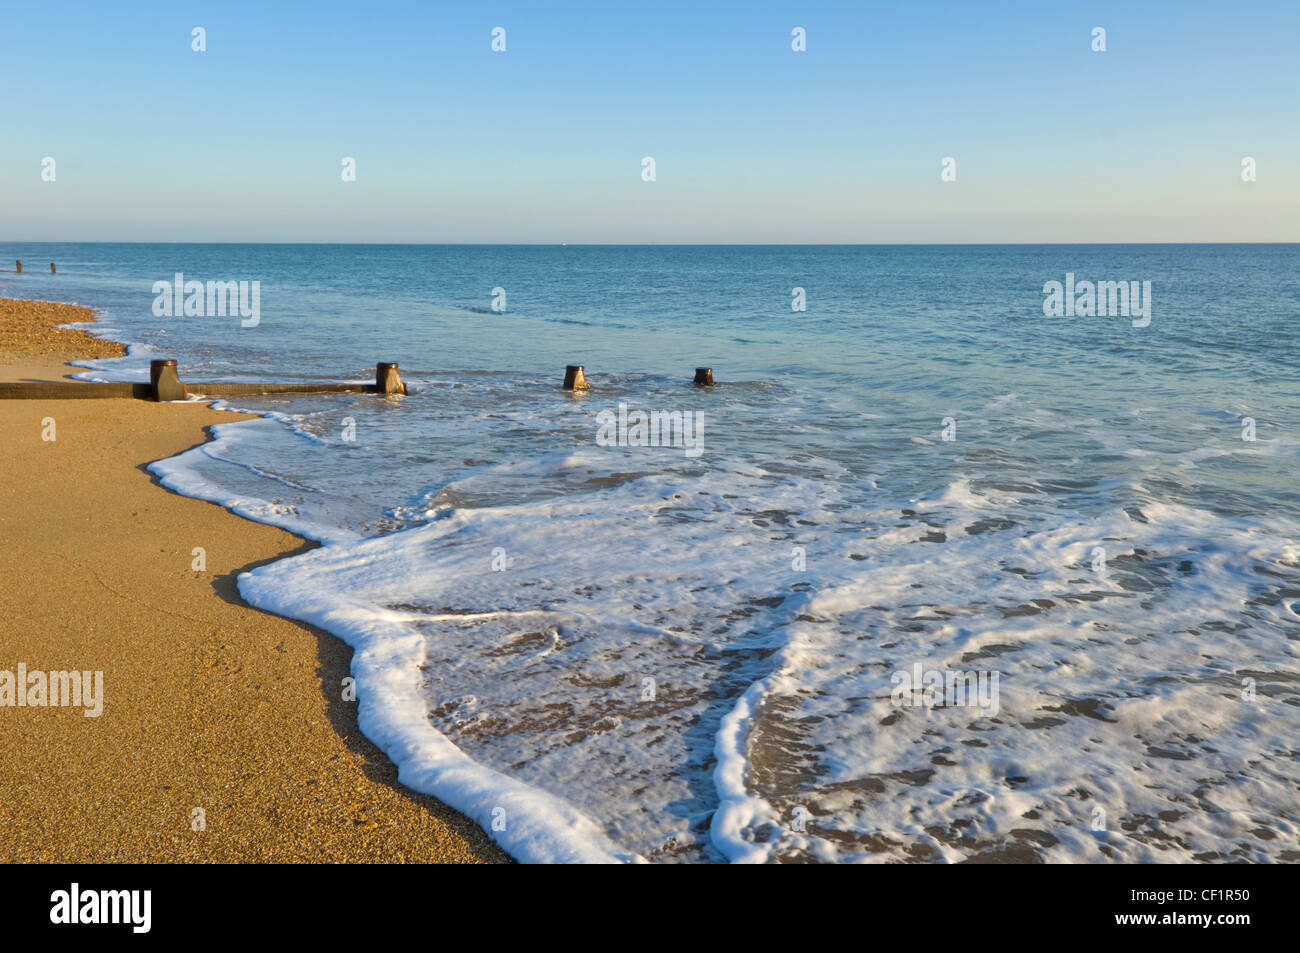 beach-hayling-island-hampshire-uk-CF1R50